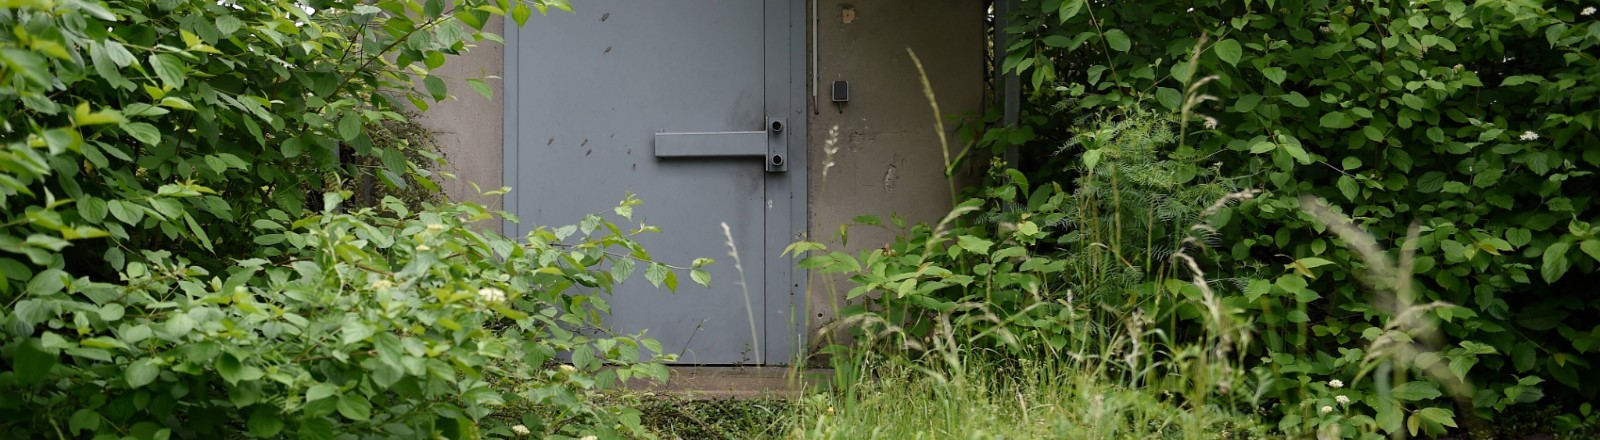 Atom-Schutz-Bunker der Stadtverwaltung Frankfurt